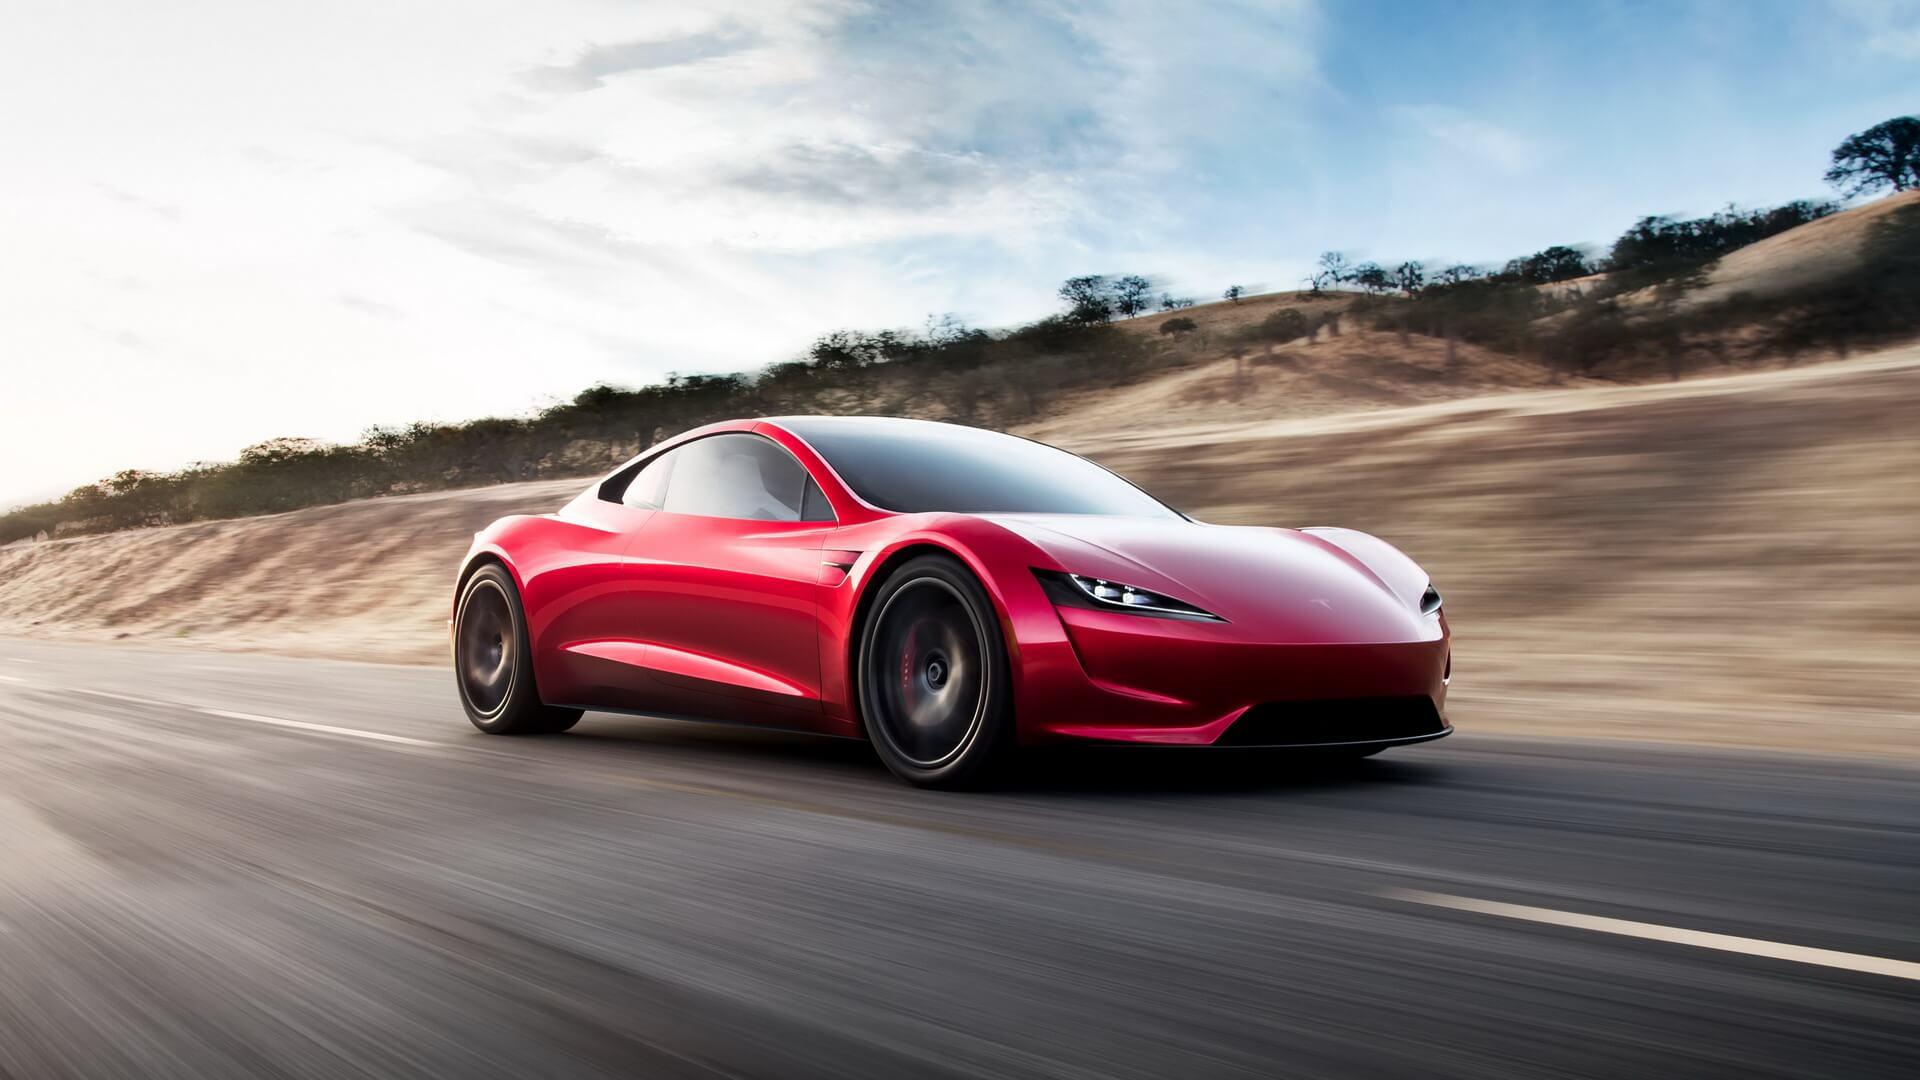 Електрокар Tesla Roaster 2